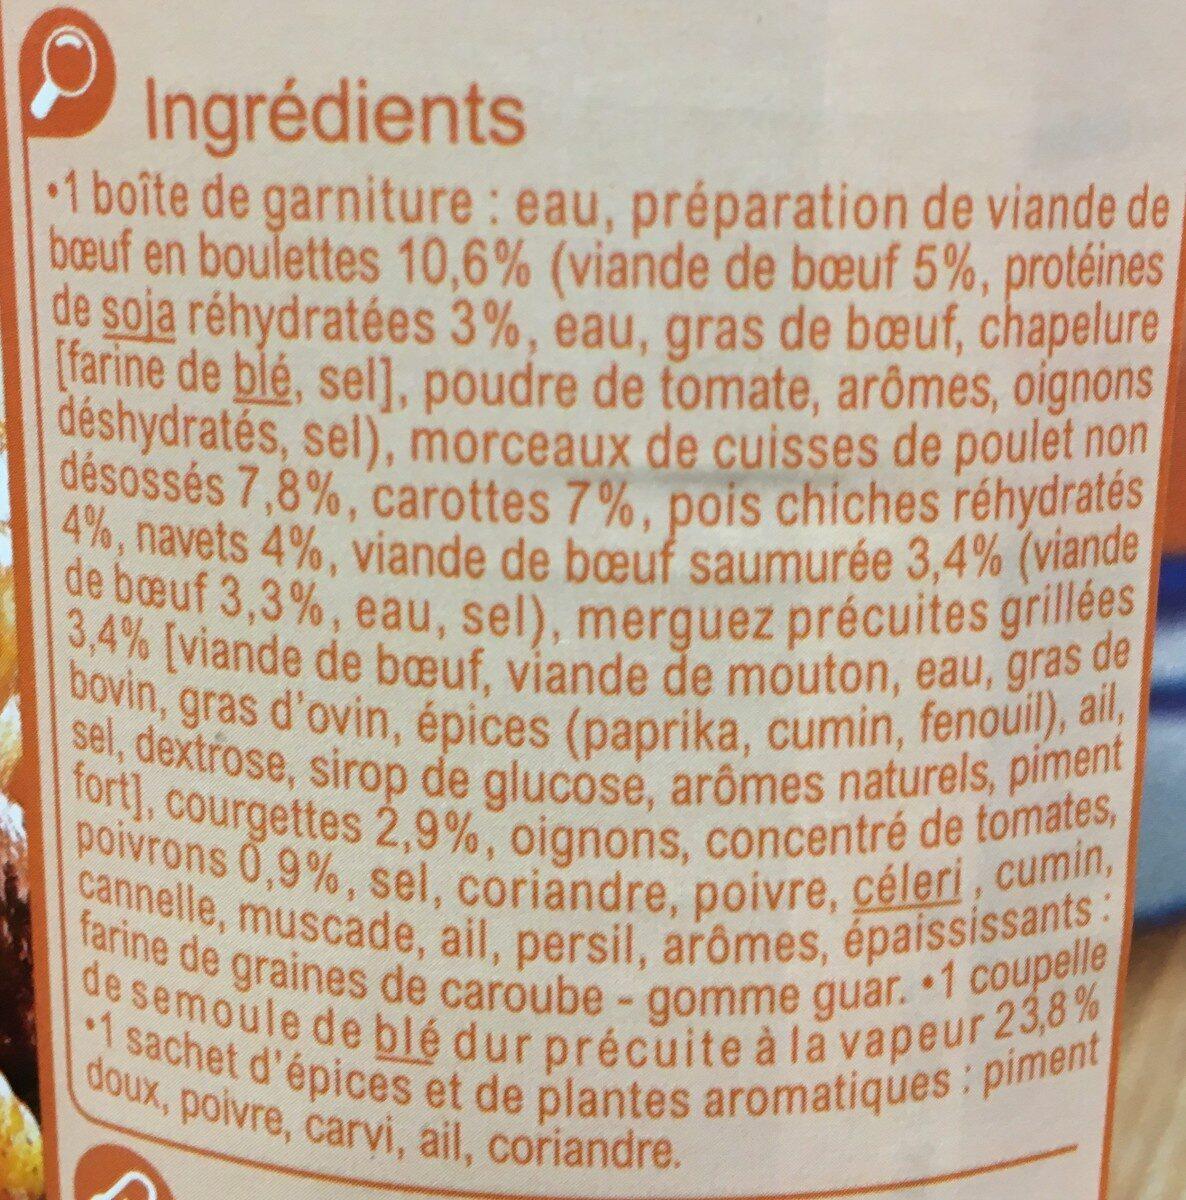 Couscous royal 1050g - Ingredients